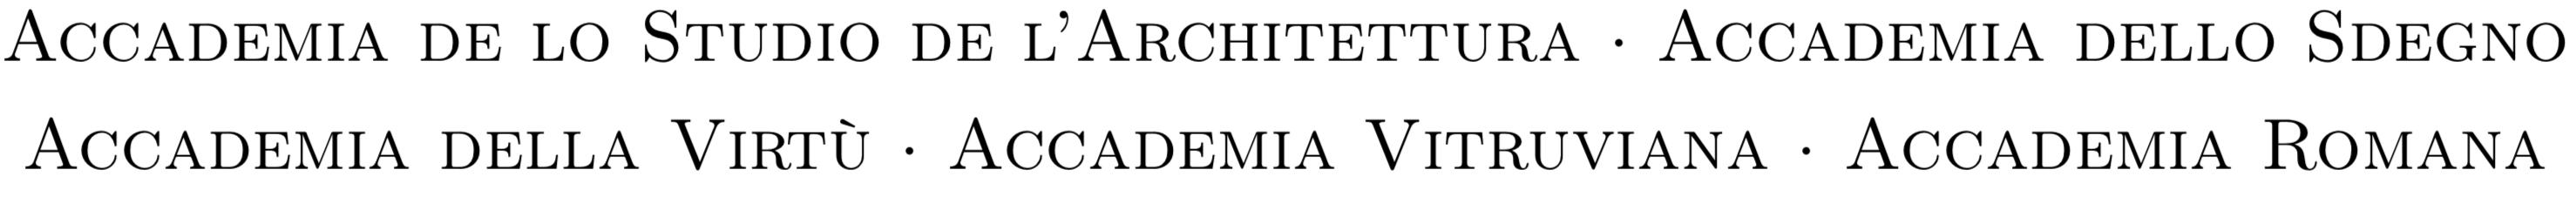 Accademia Romana